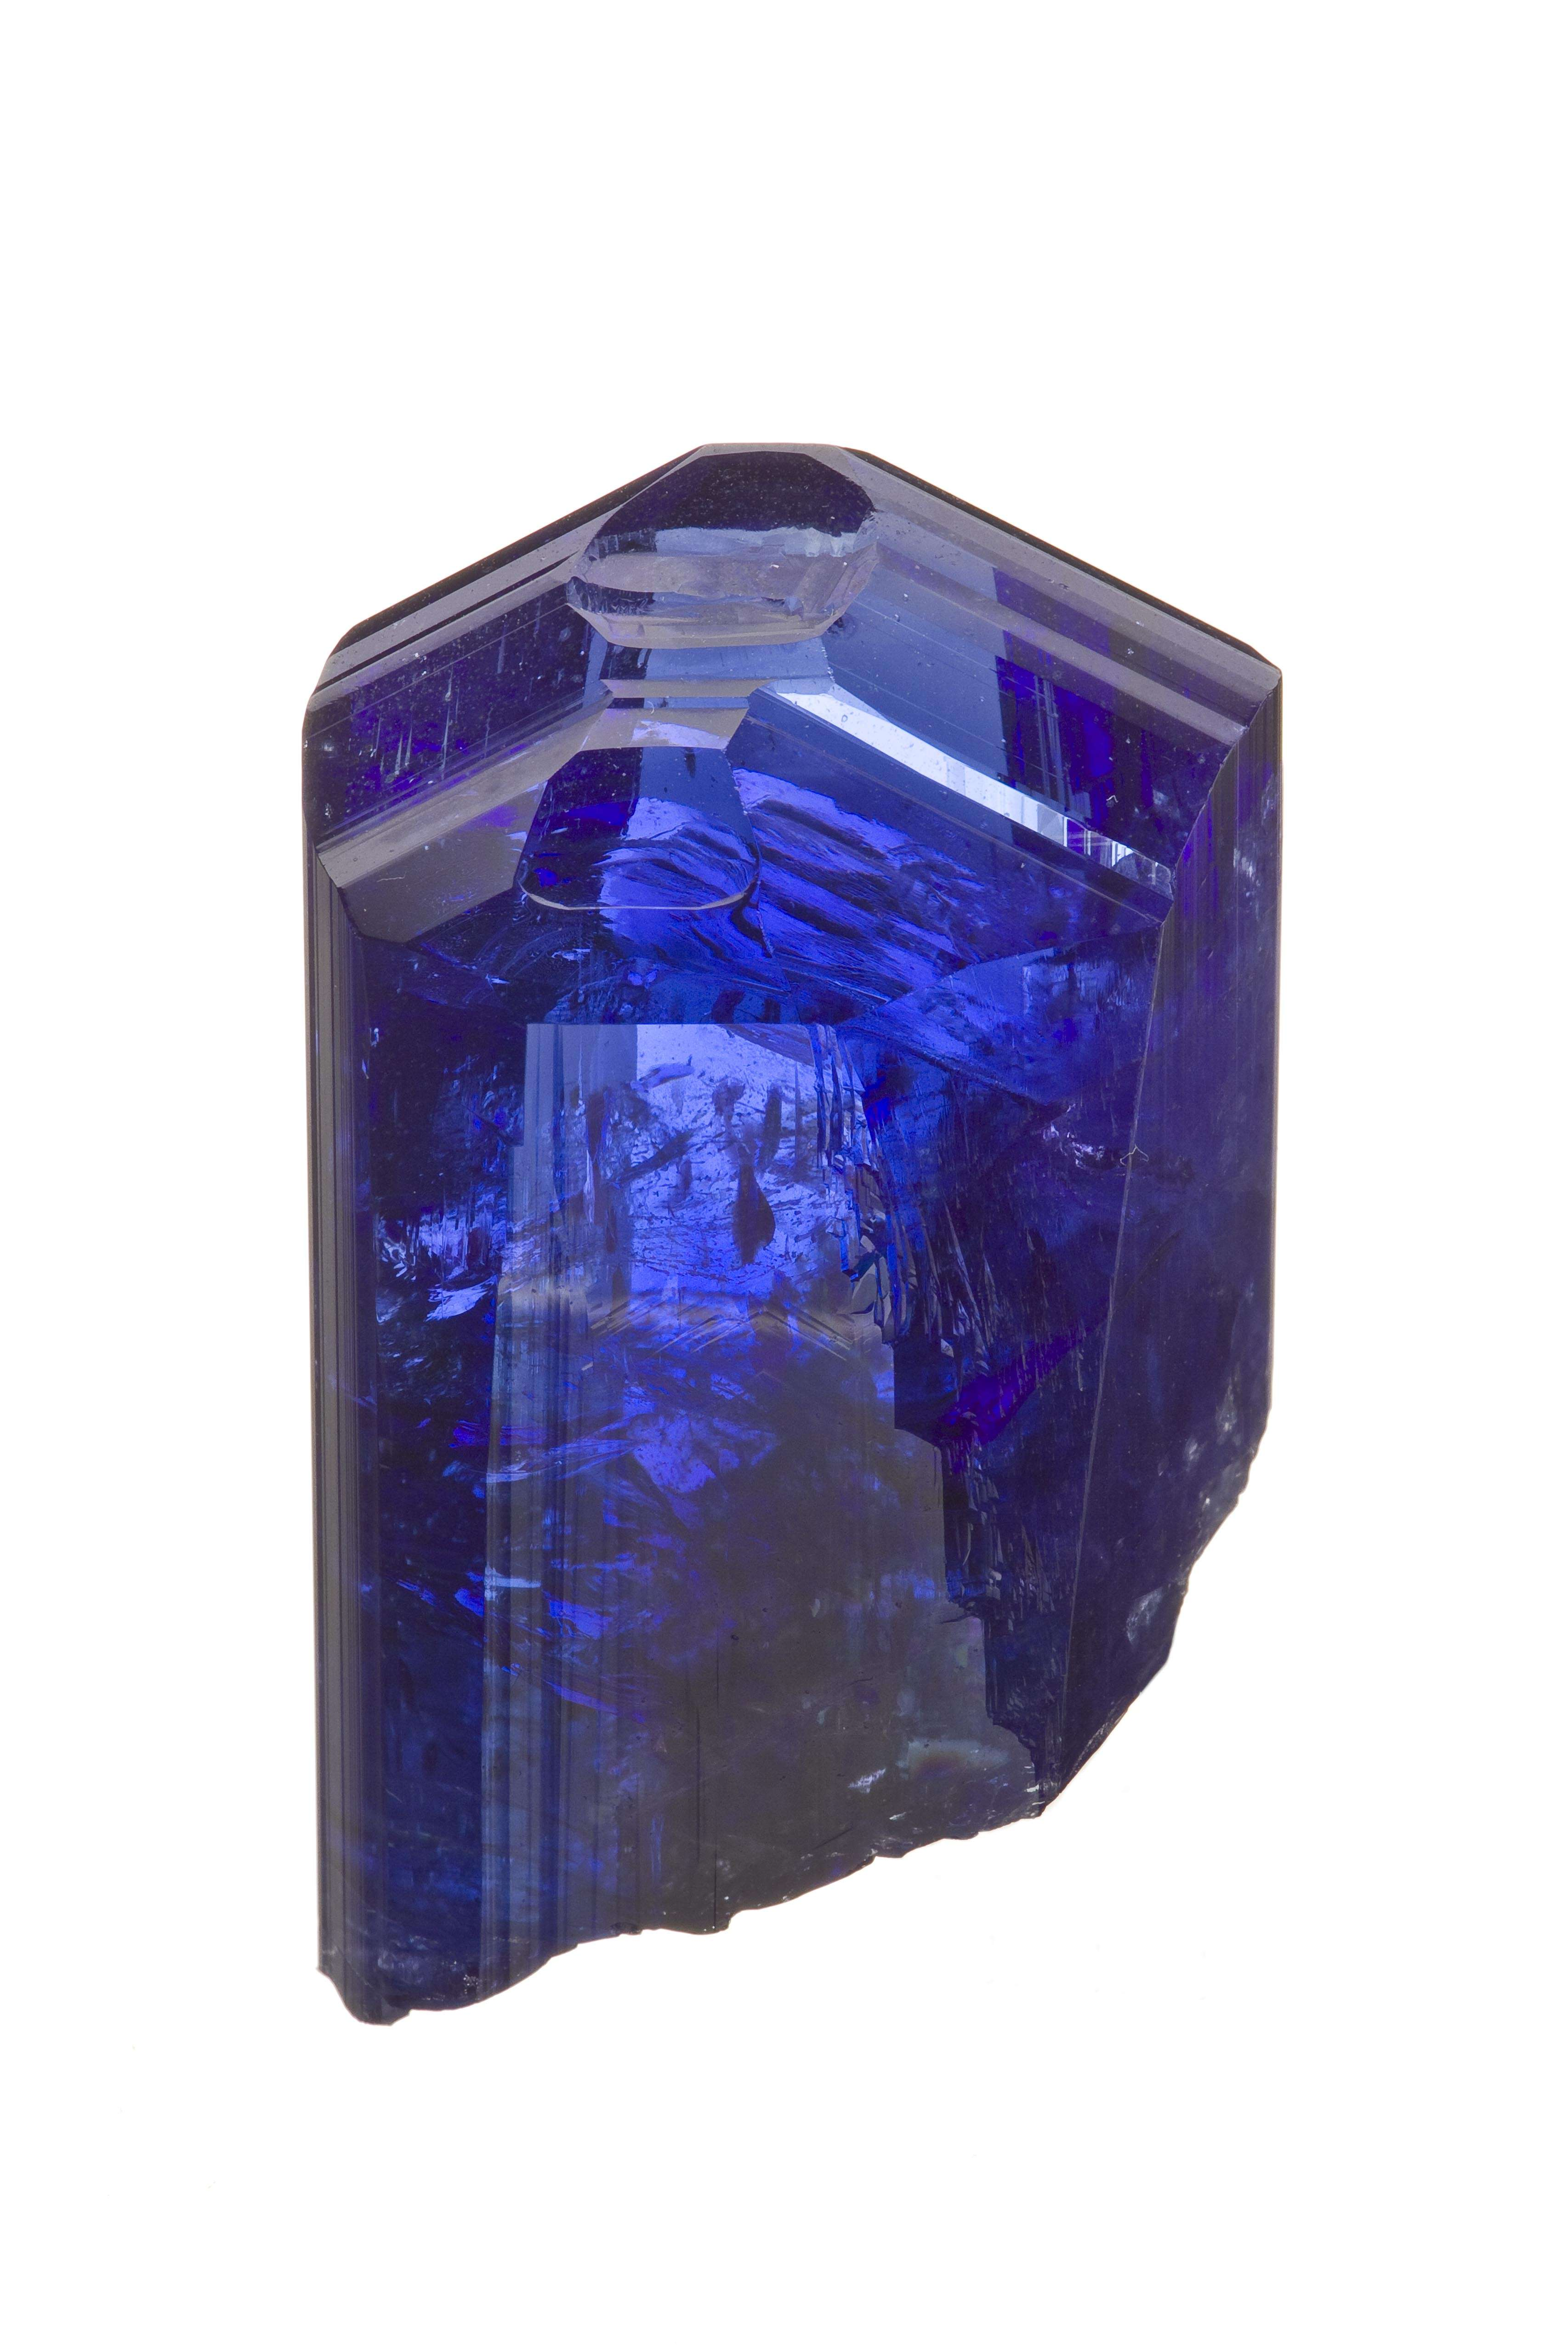 A stunningly intense deep blue crystal natural unheated The piece